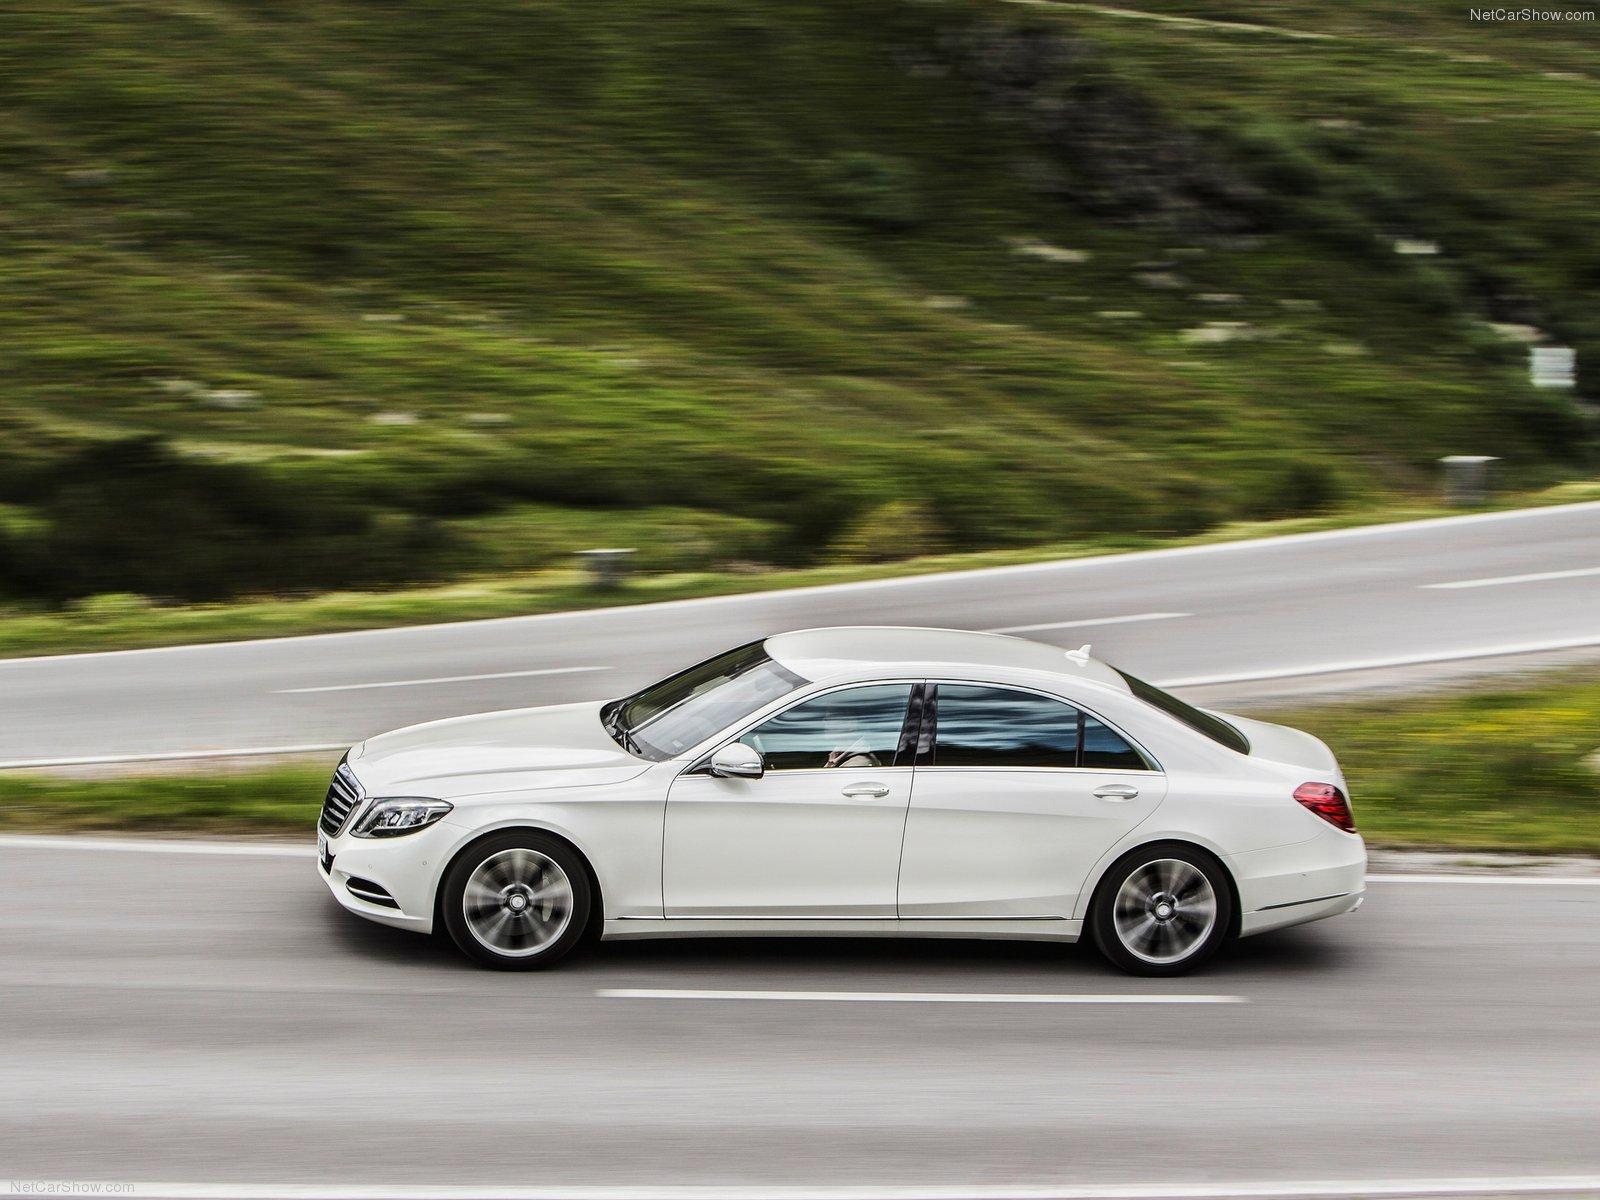 Mercedes-Benz S500 Plug-In Hybrid picture # 129101 | Mercedes-Benz ...